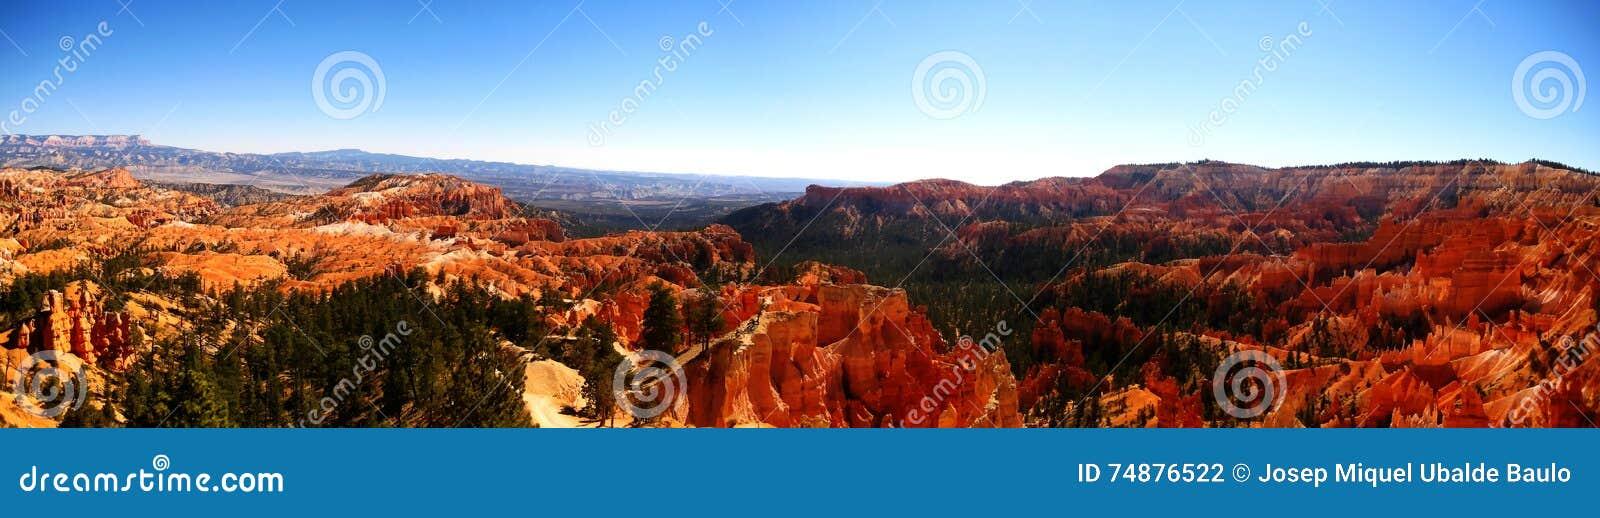 Panorama do ponto do nascer do sol da garganta de Bryce